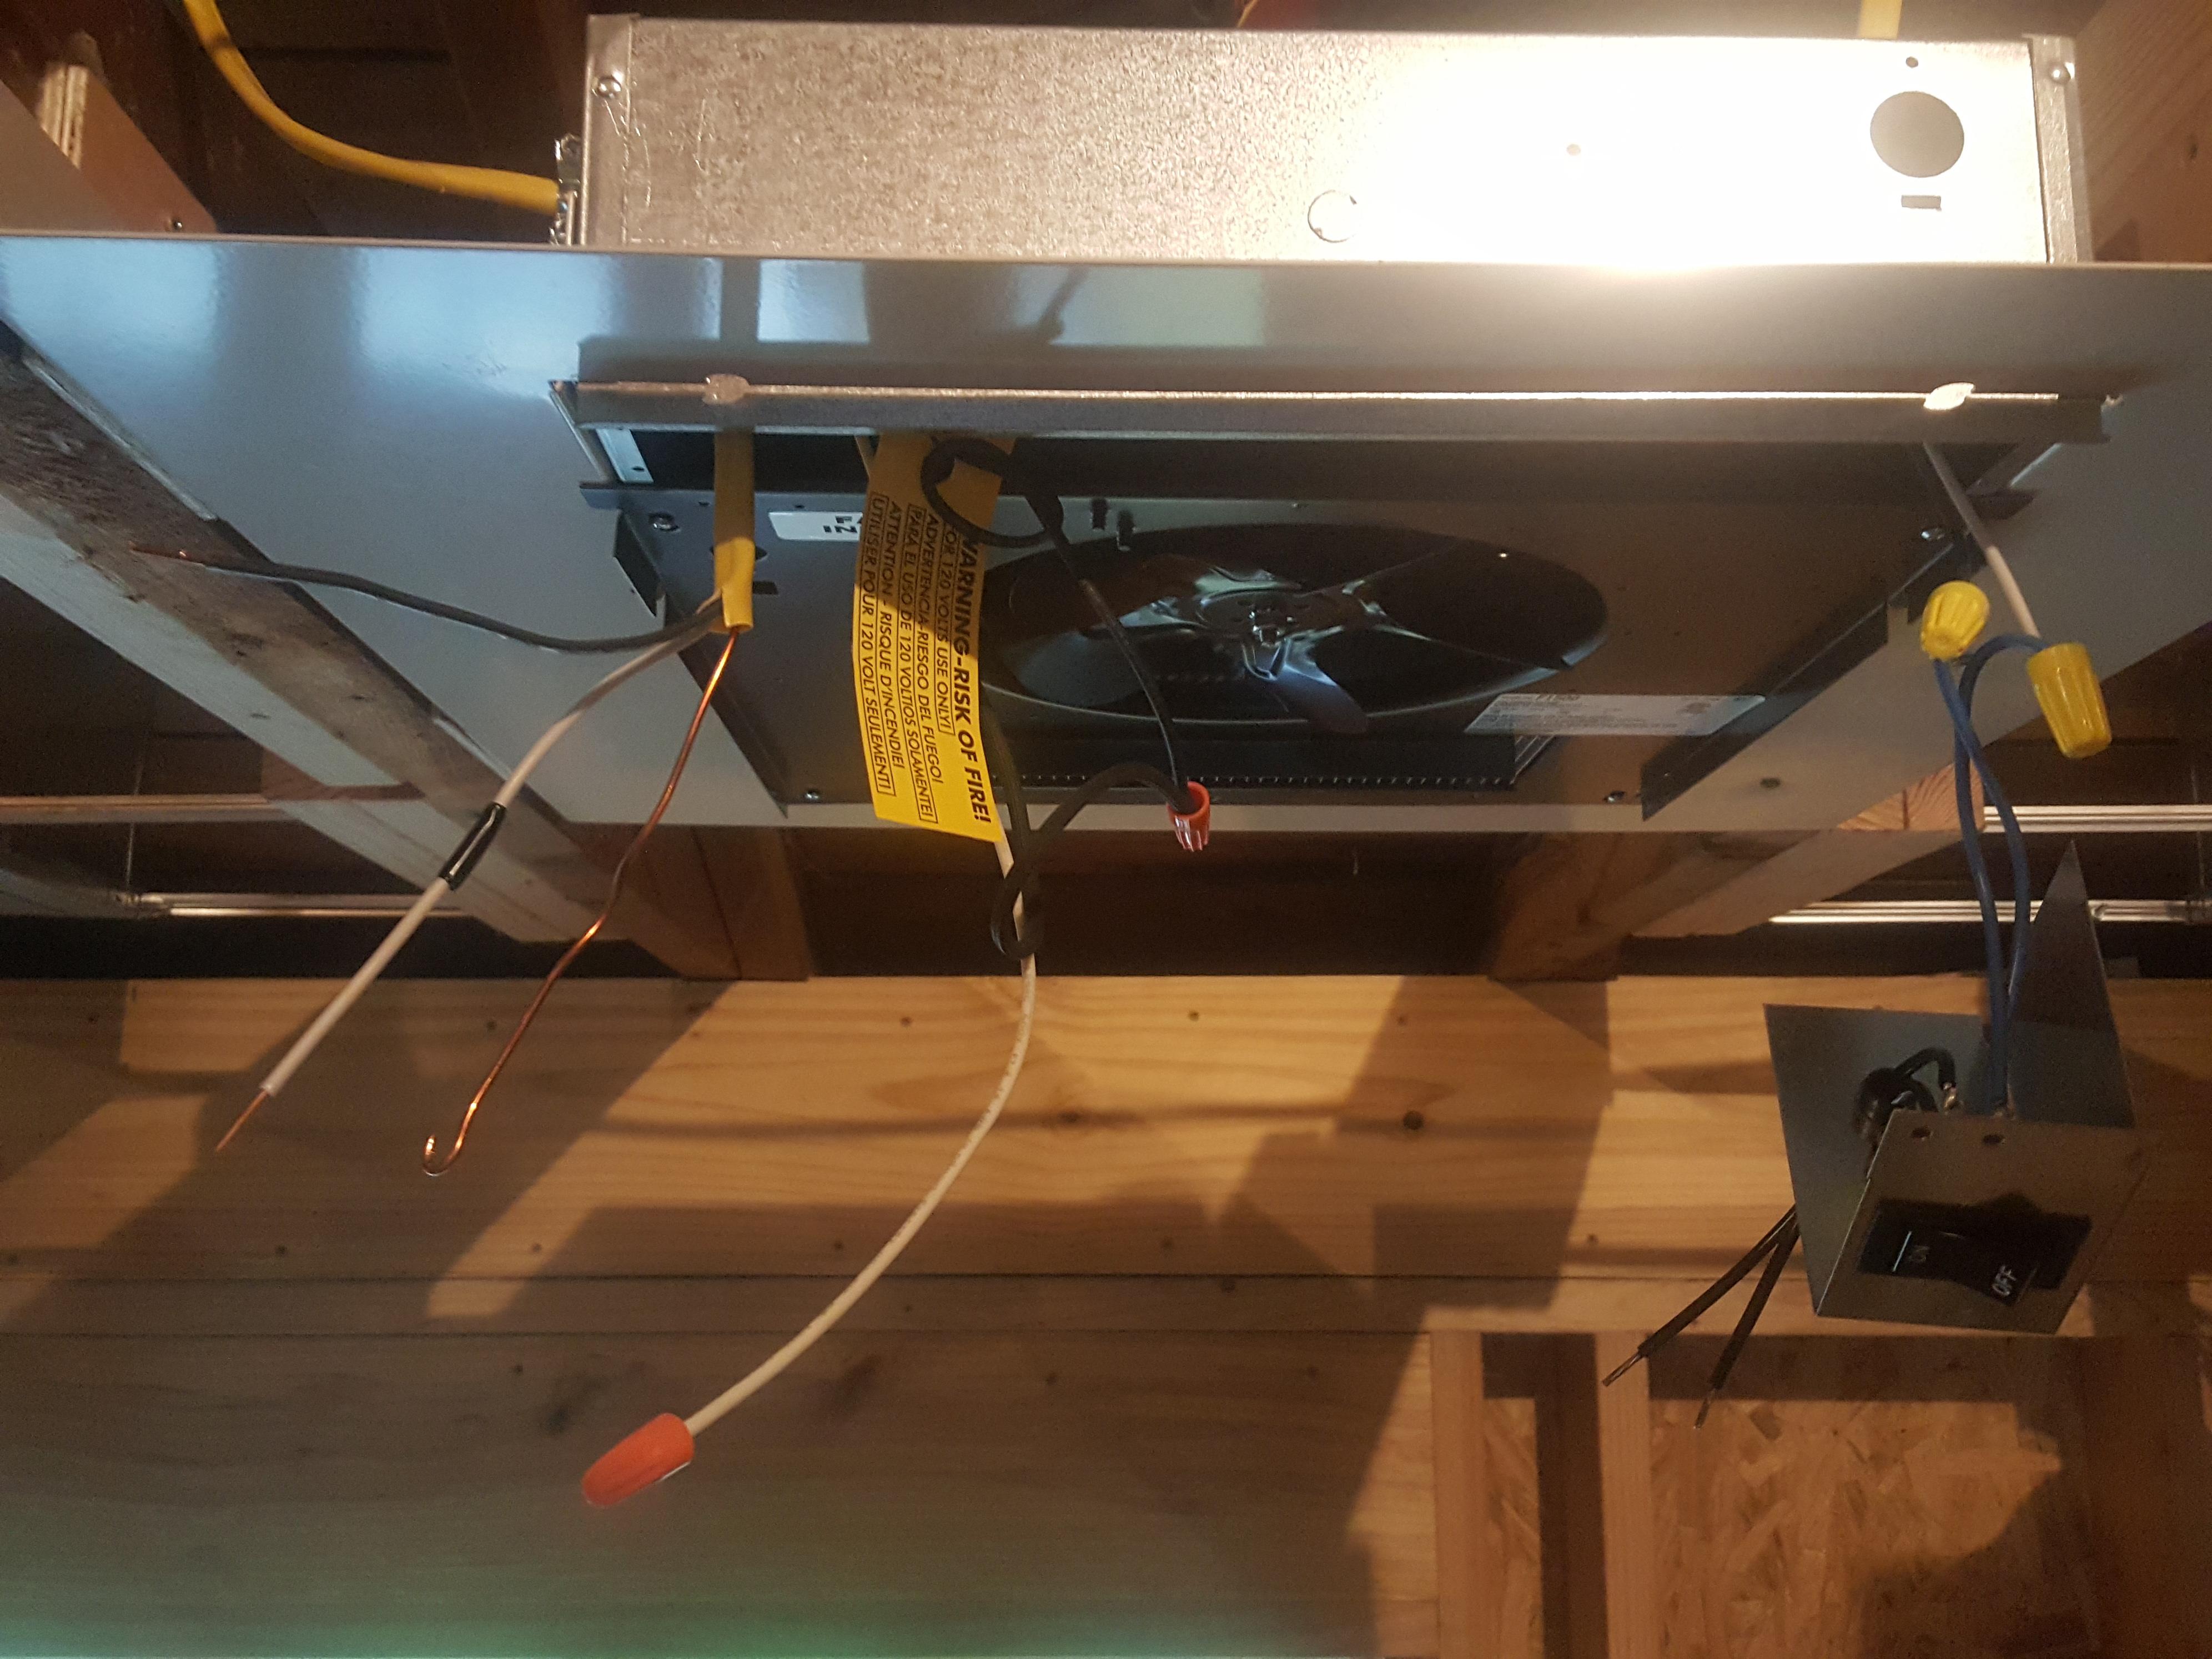 I Am Trying To Install A Marley Qmark F1500 Fan Forced Ceiling Baseboard Heater Wiring Diagram 20170617 115112